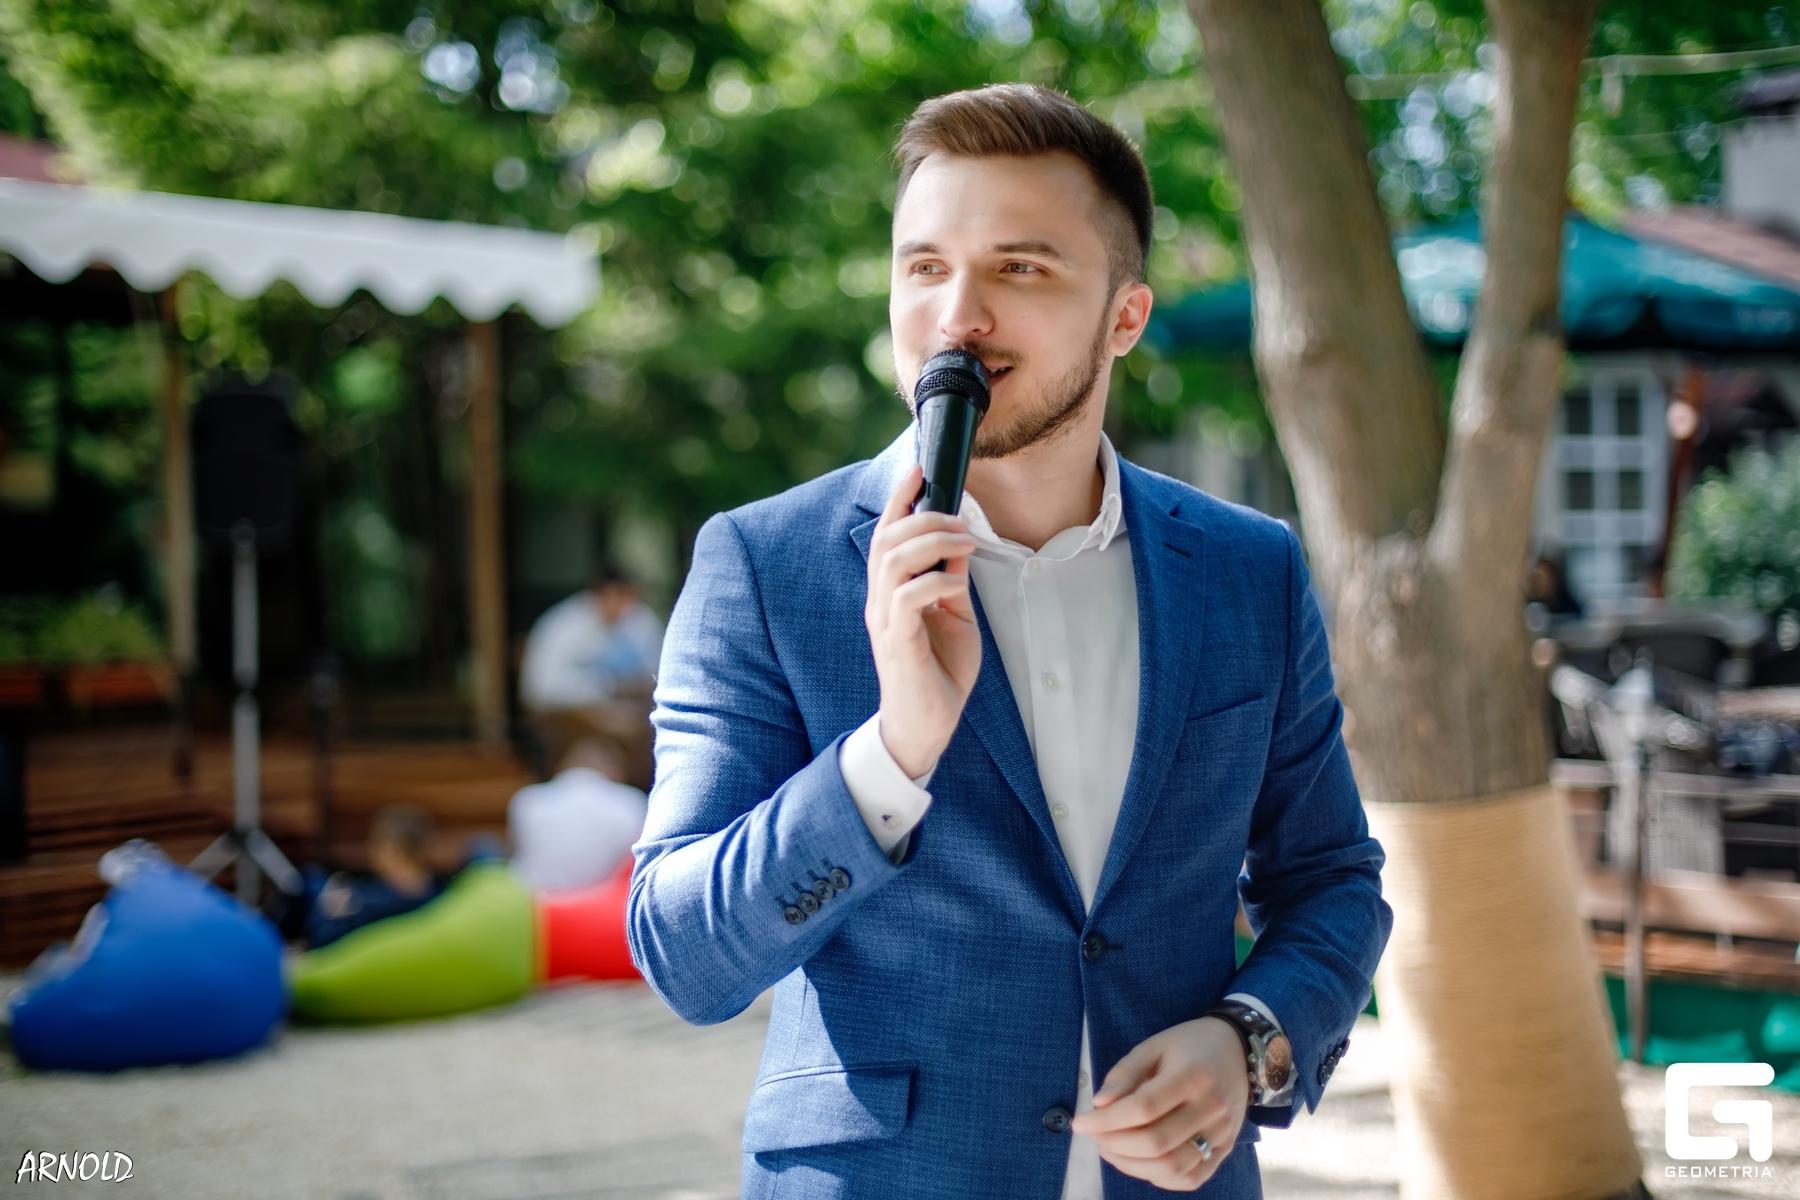 Валентин Федюнин в Ростове-на-Дону